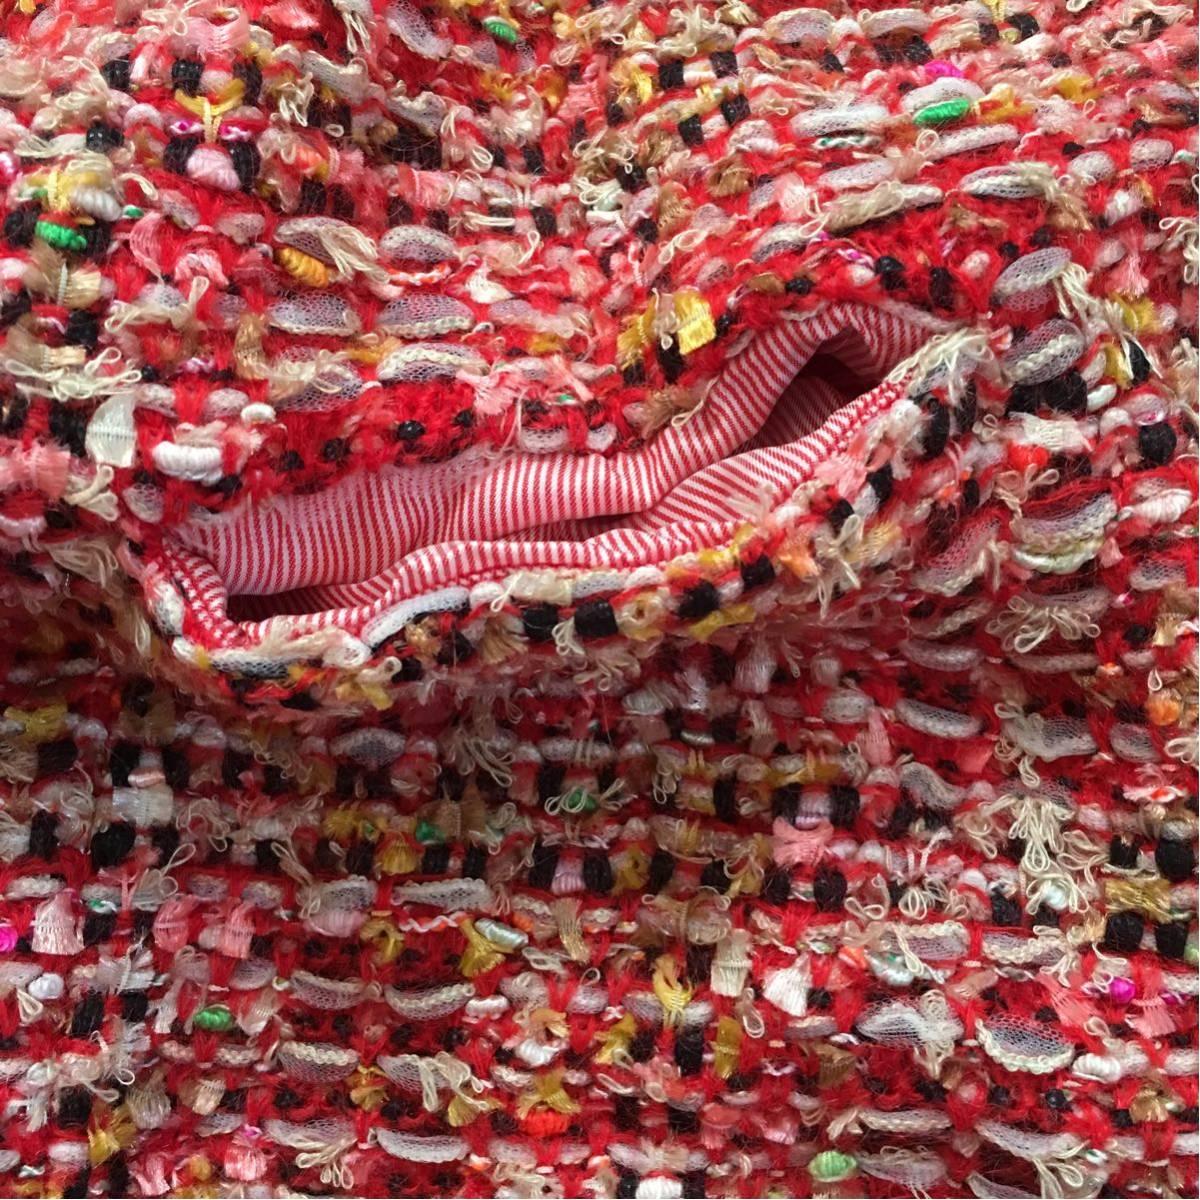 k 美品 Coohem(コーヘン) 個性的なツイードコート 赤系 36サイズ 可愛いジャケットコート_画像9